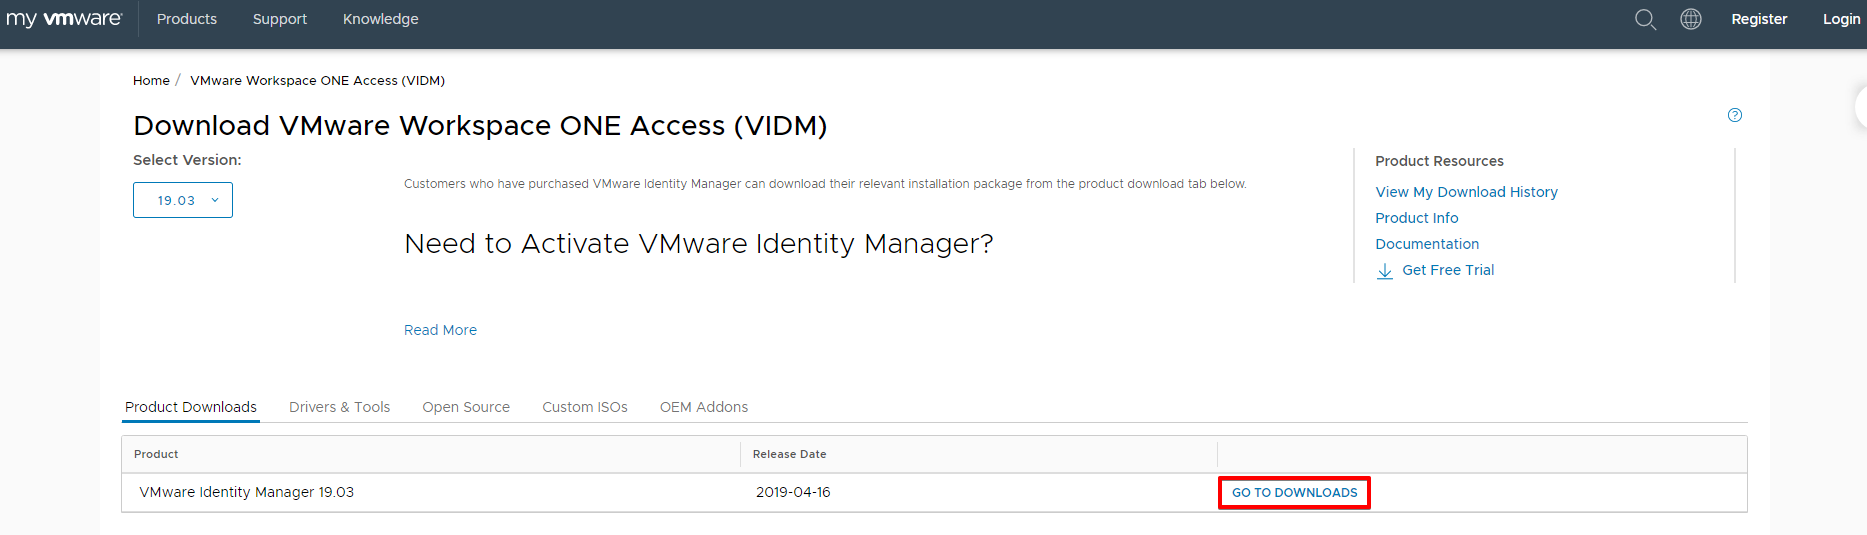 Download VMware Identity Manager - My VMware - Goo